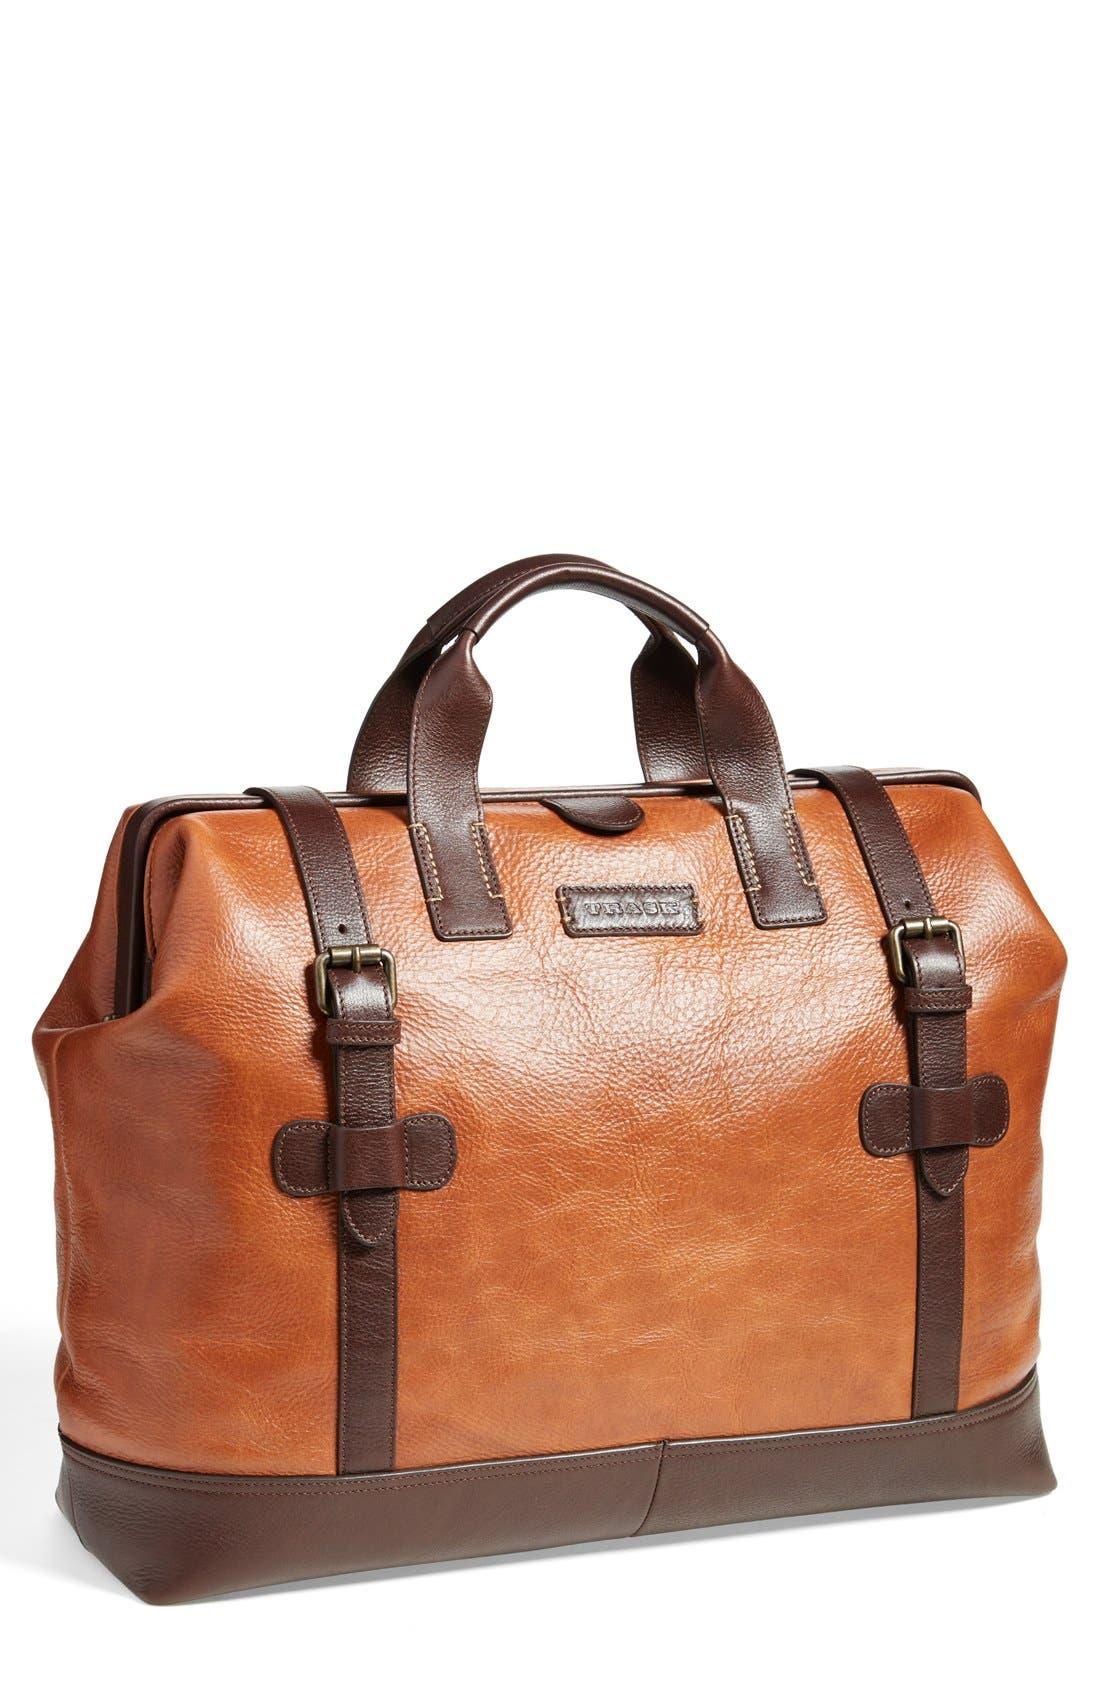 Trask 'Jackson' Gladstone Bag